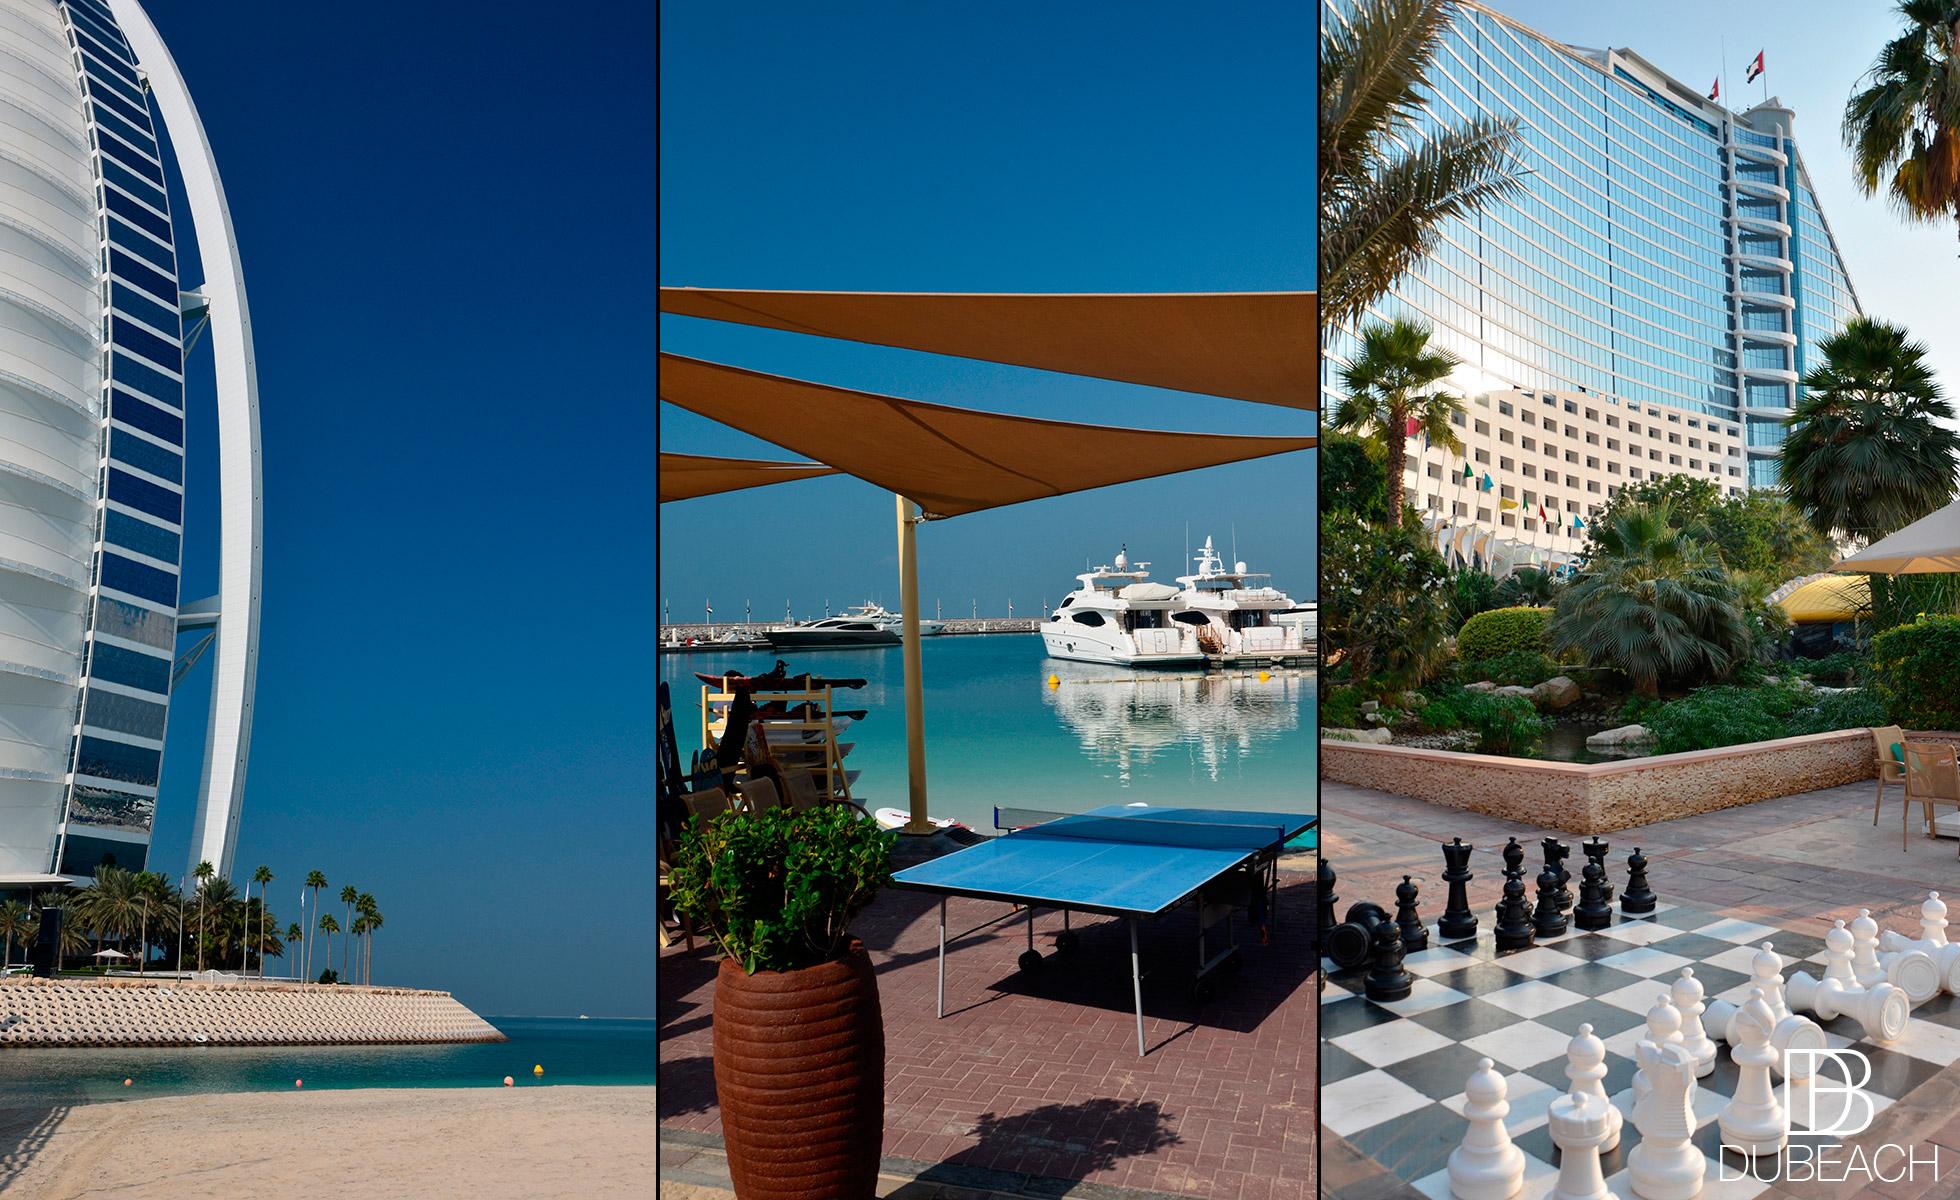 flirting games at the beach resort hotel dubai hotel